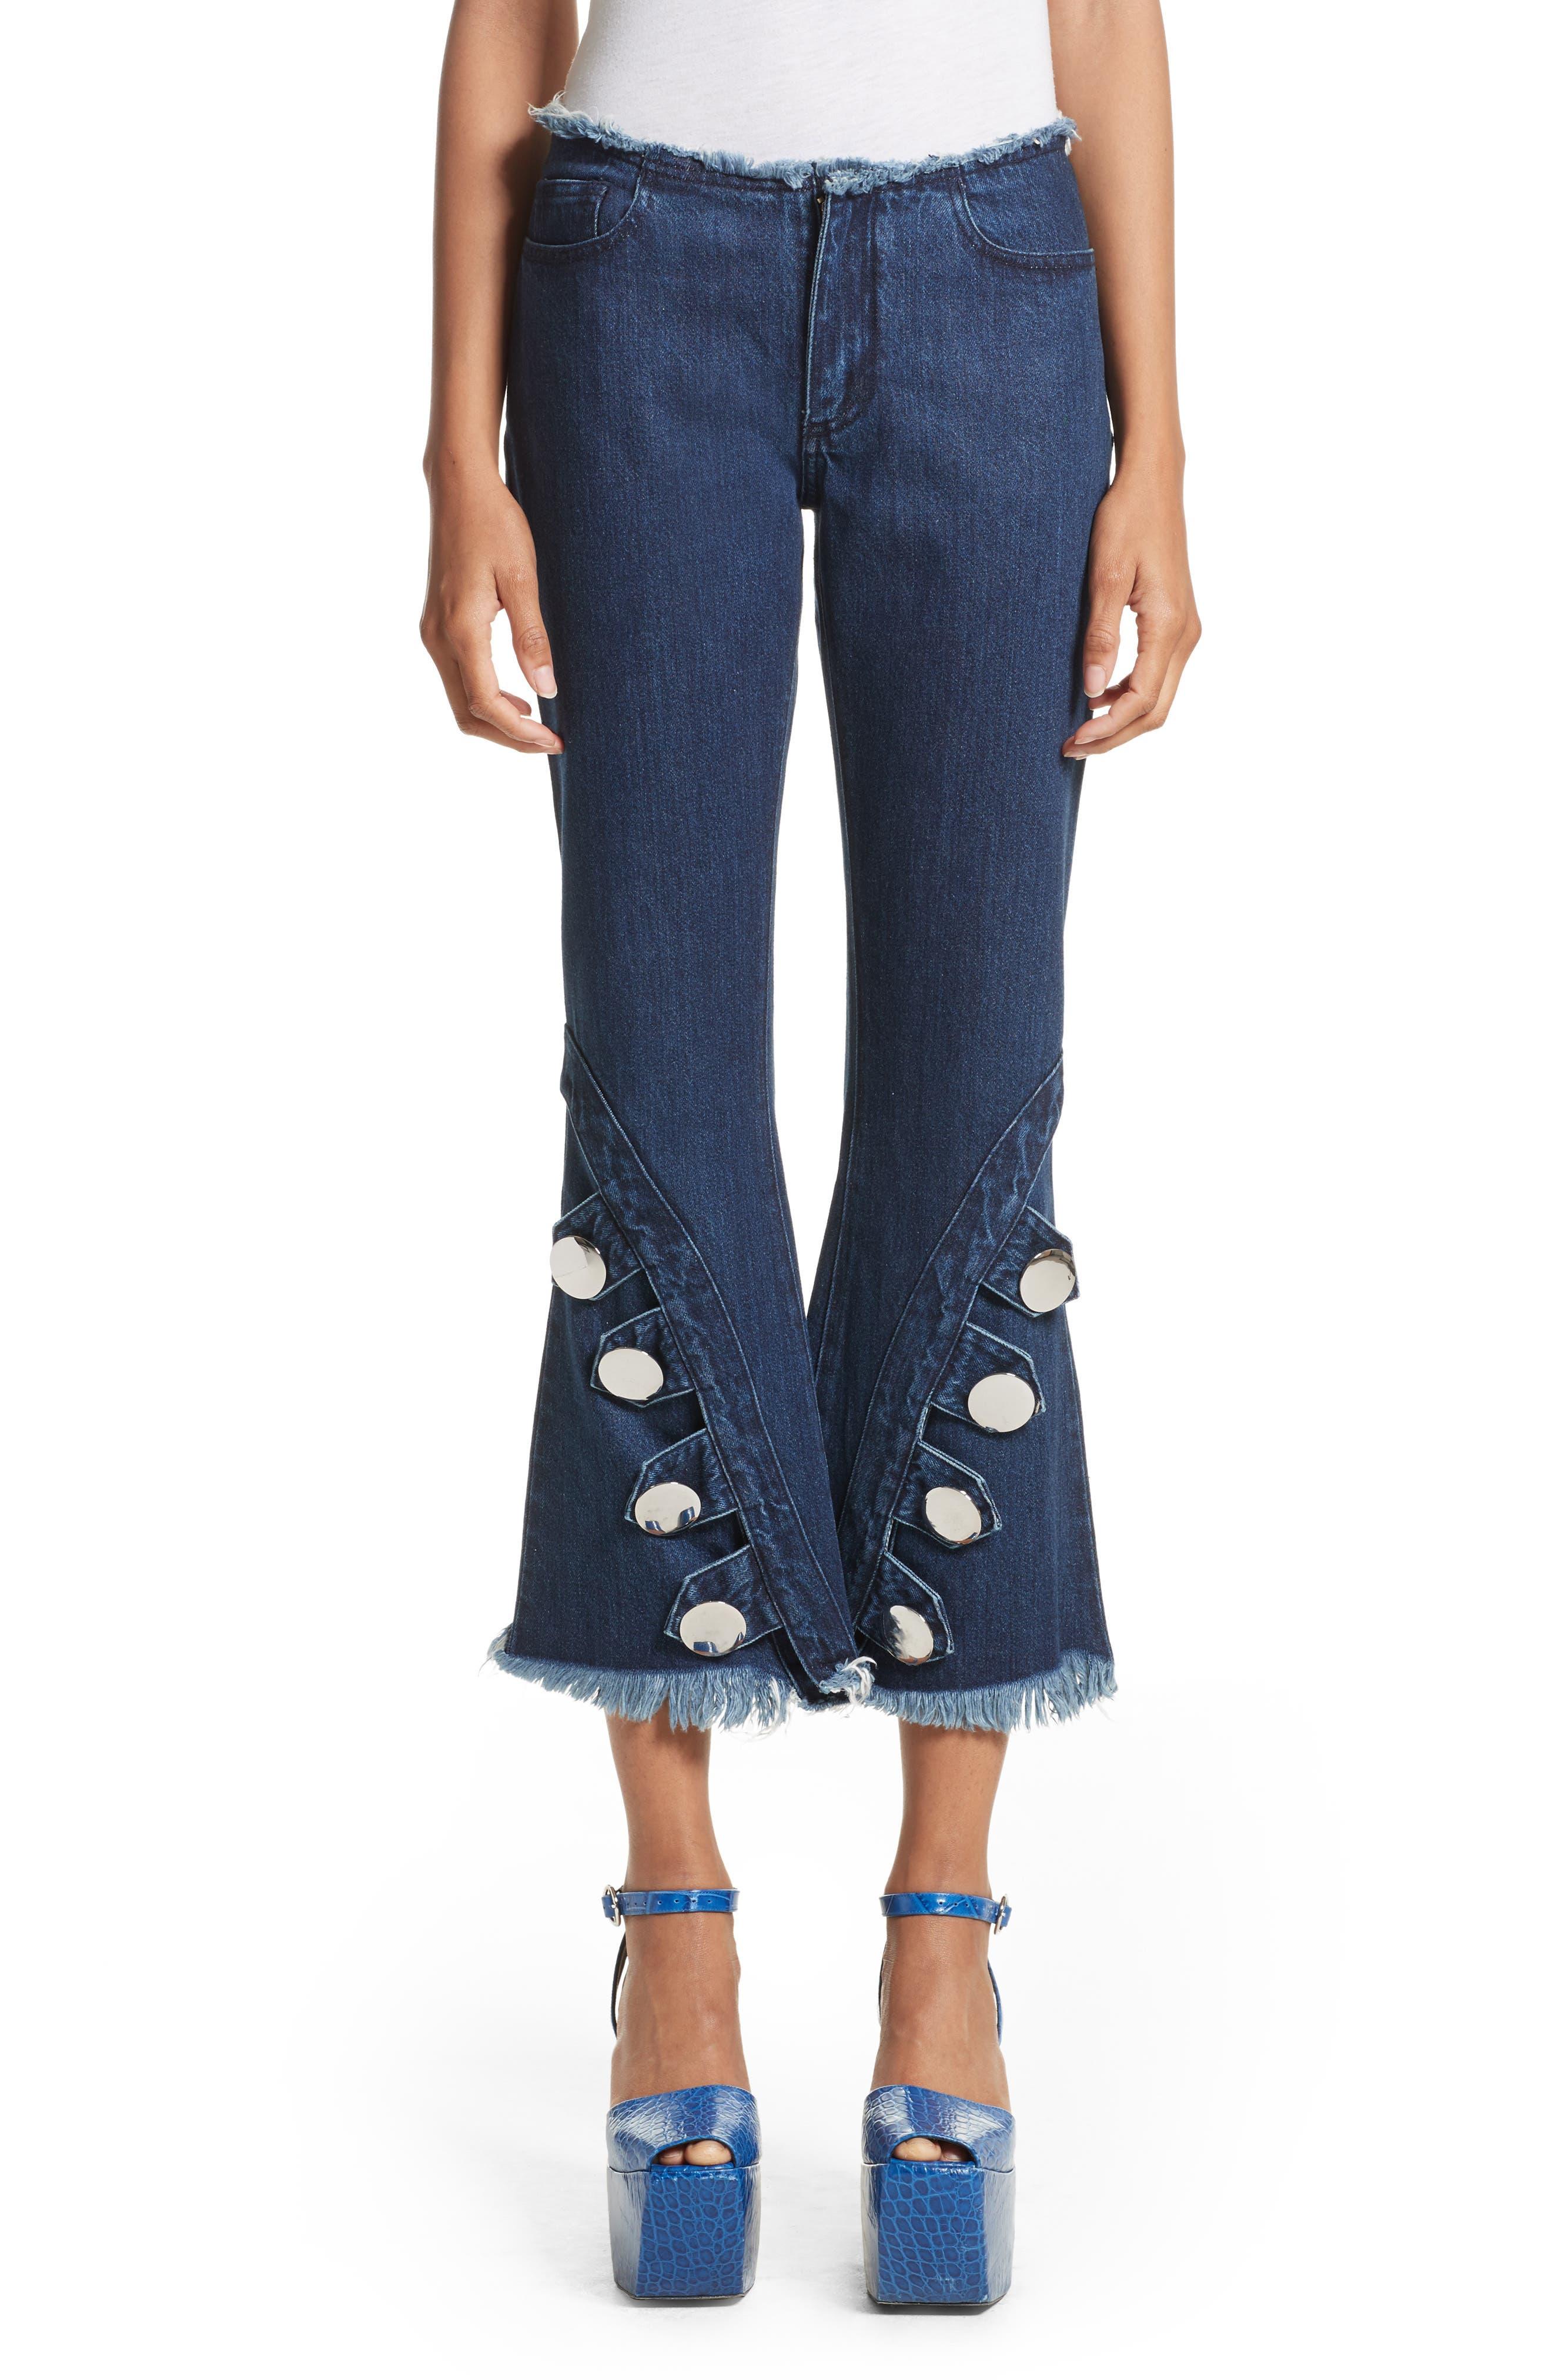 MARQUES'ALMEIDA MarquesAlmeida Button Trim Crop Flare Jeans